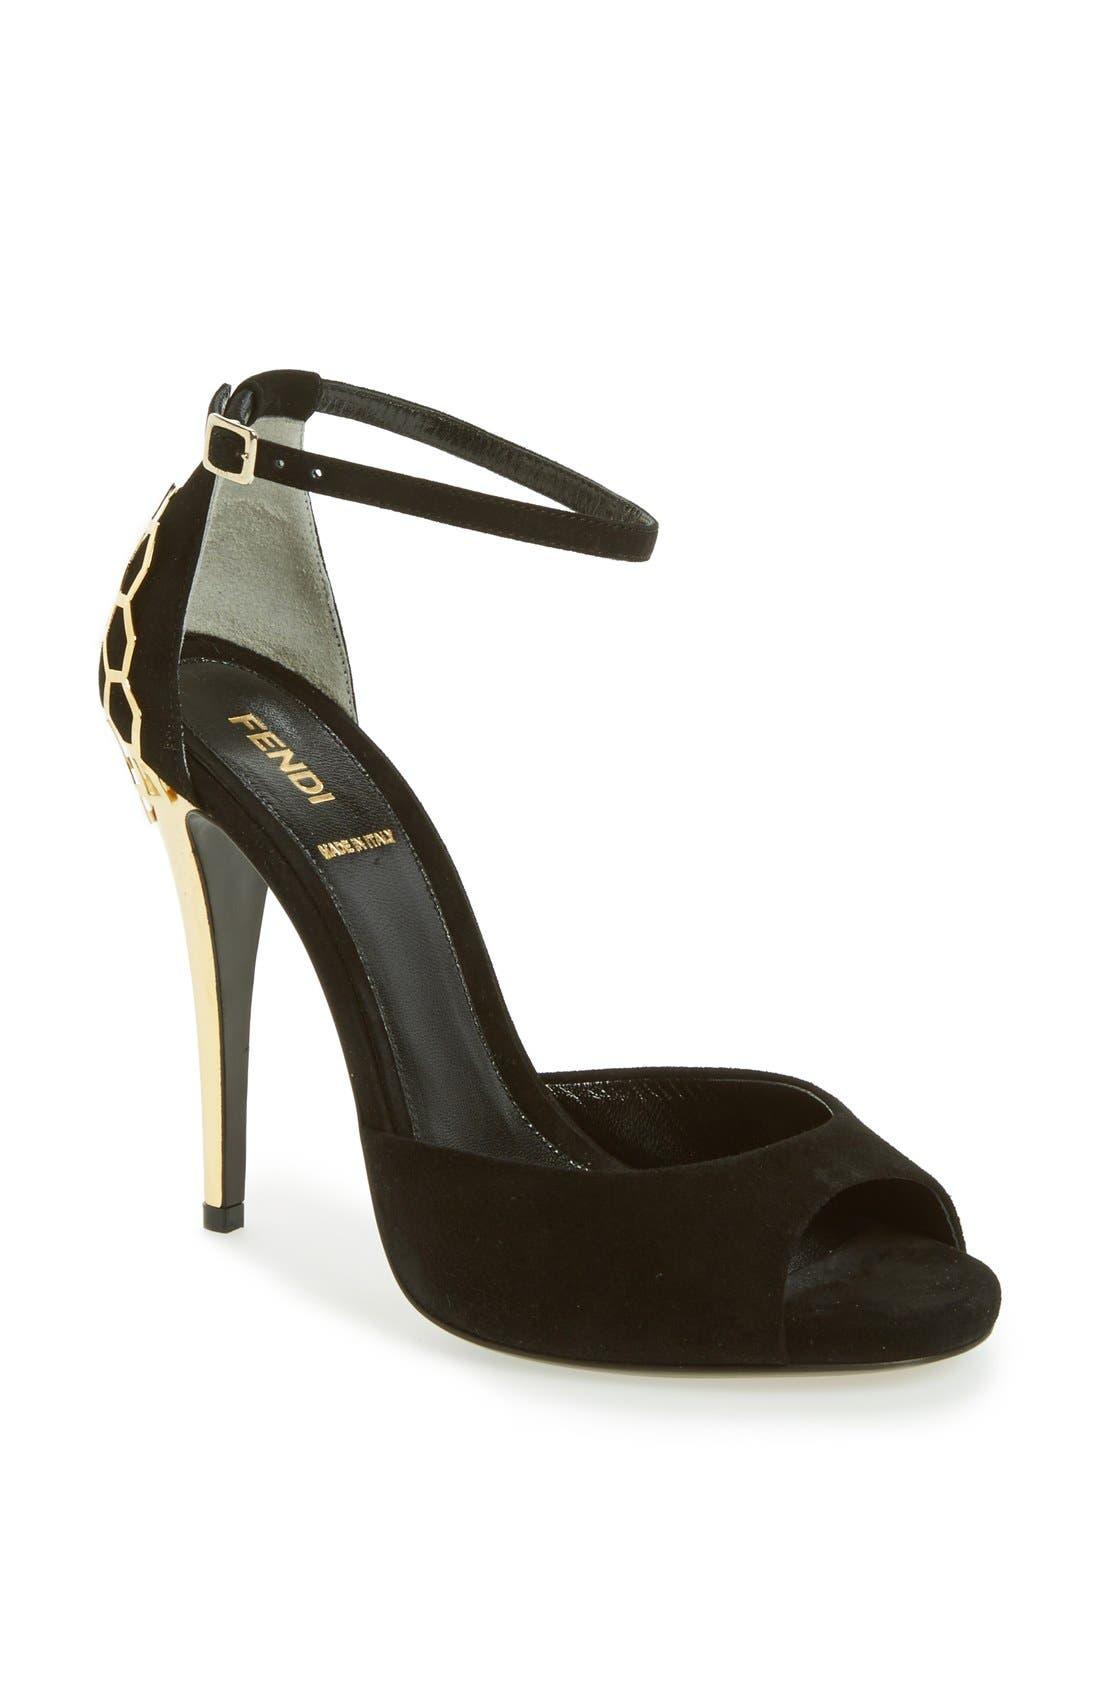 Main Image - Fendi 'Gea' Suede Ankle Strap Sandal